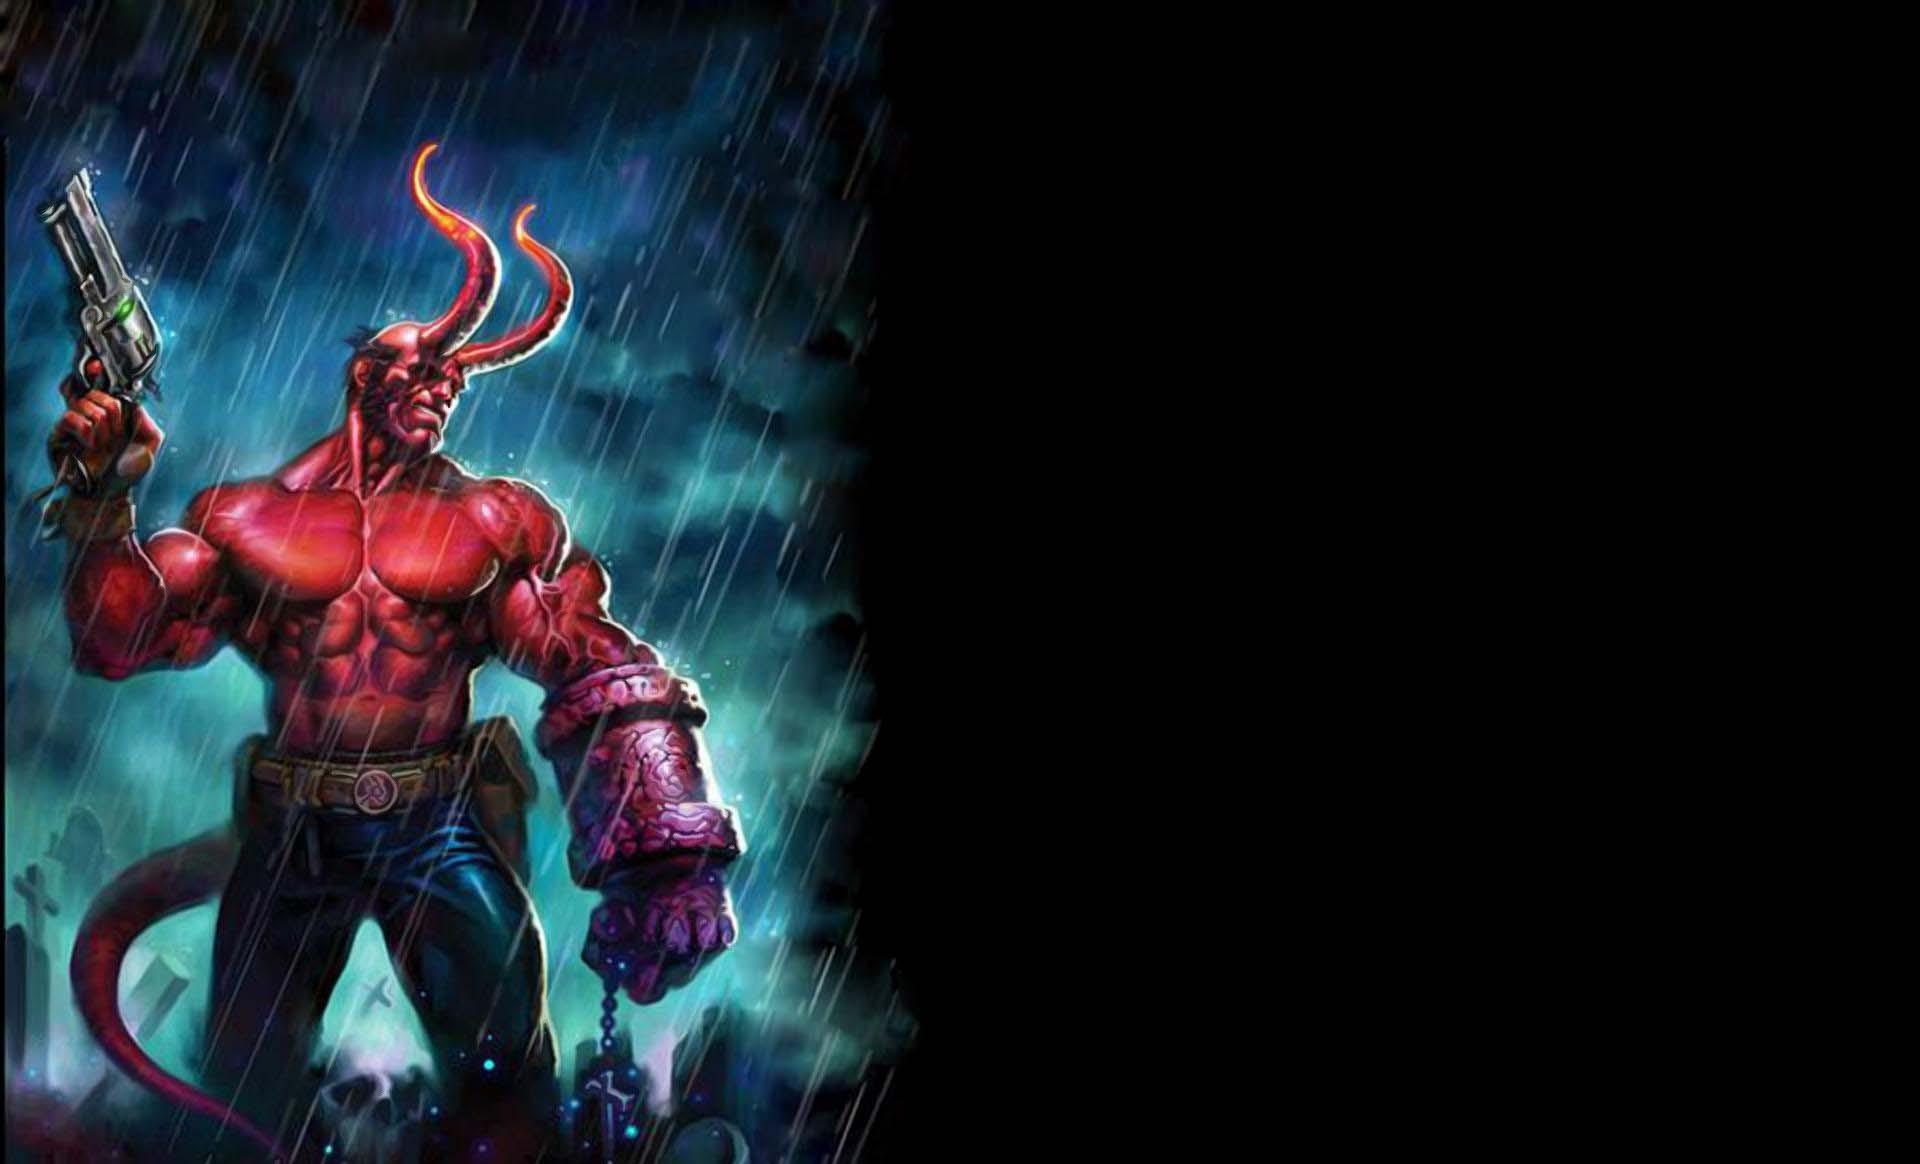 Hellboy Wallpaper Download Free Wallpaper Hd